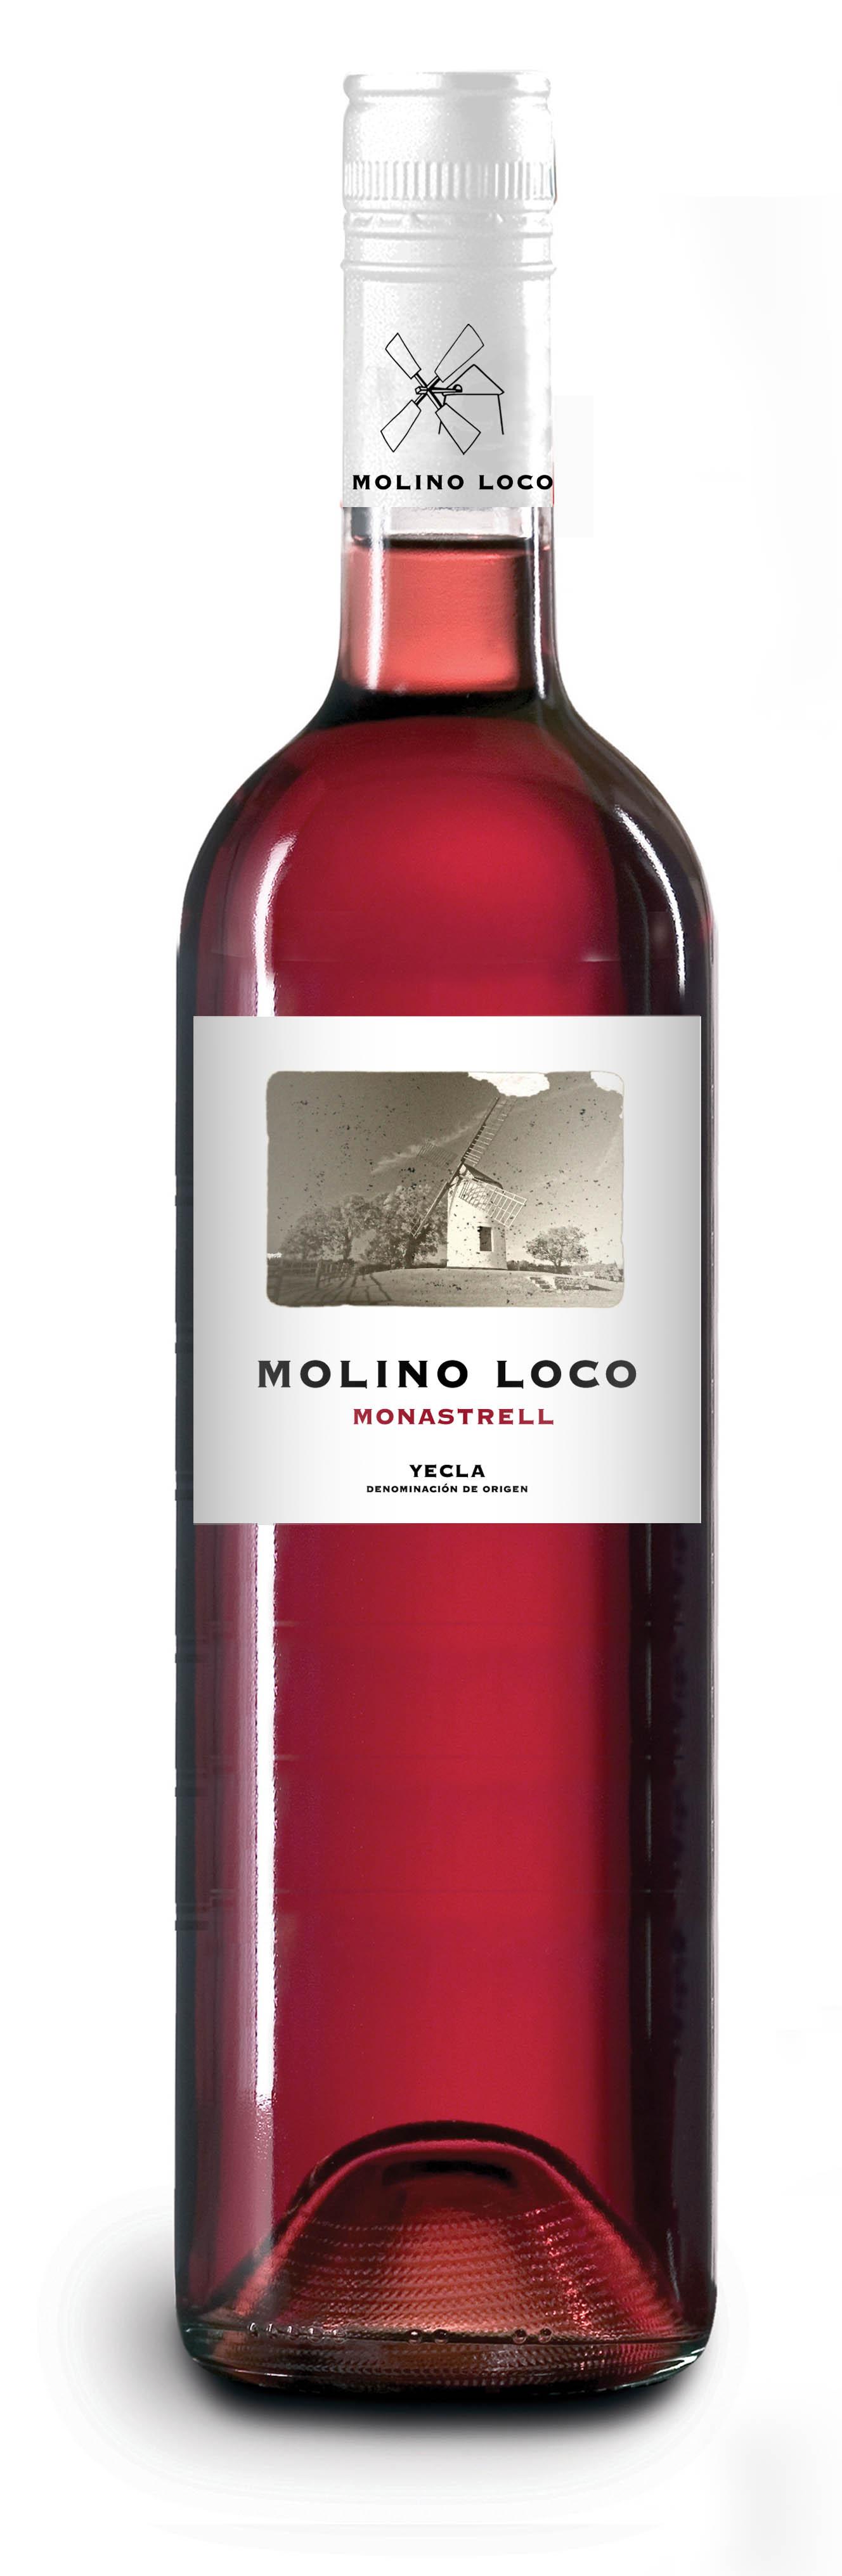 Molino Loco, Monastrell Rosado DO Yecla 2016